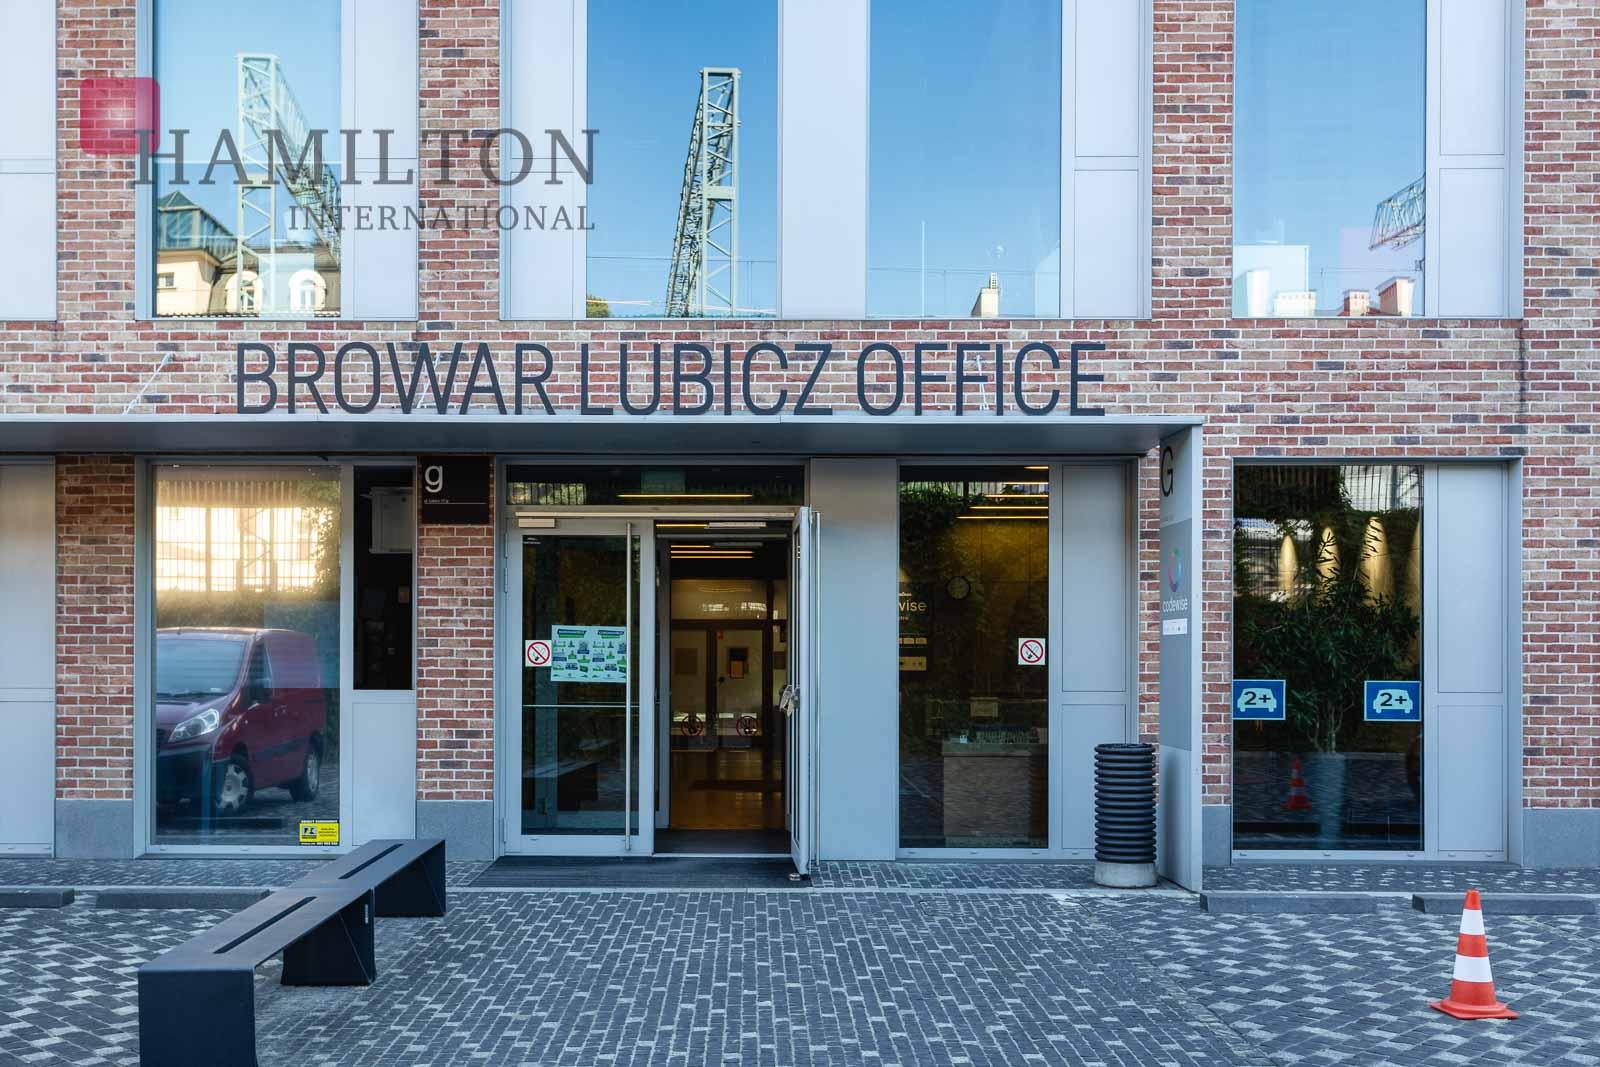 Browar Lubicz G Krakow office building photo